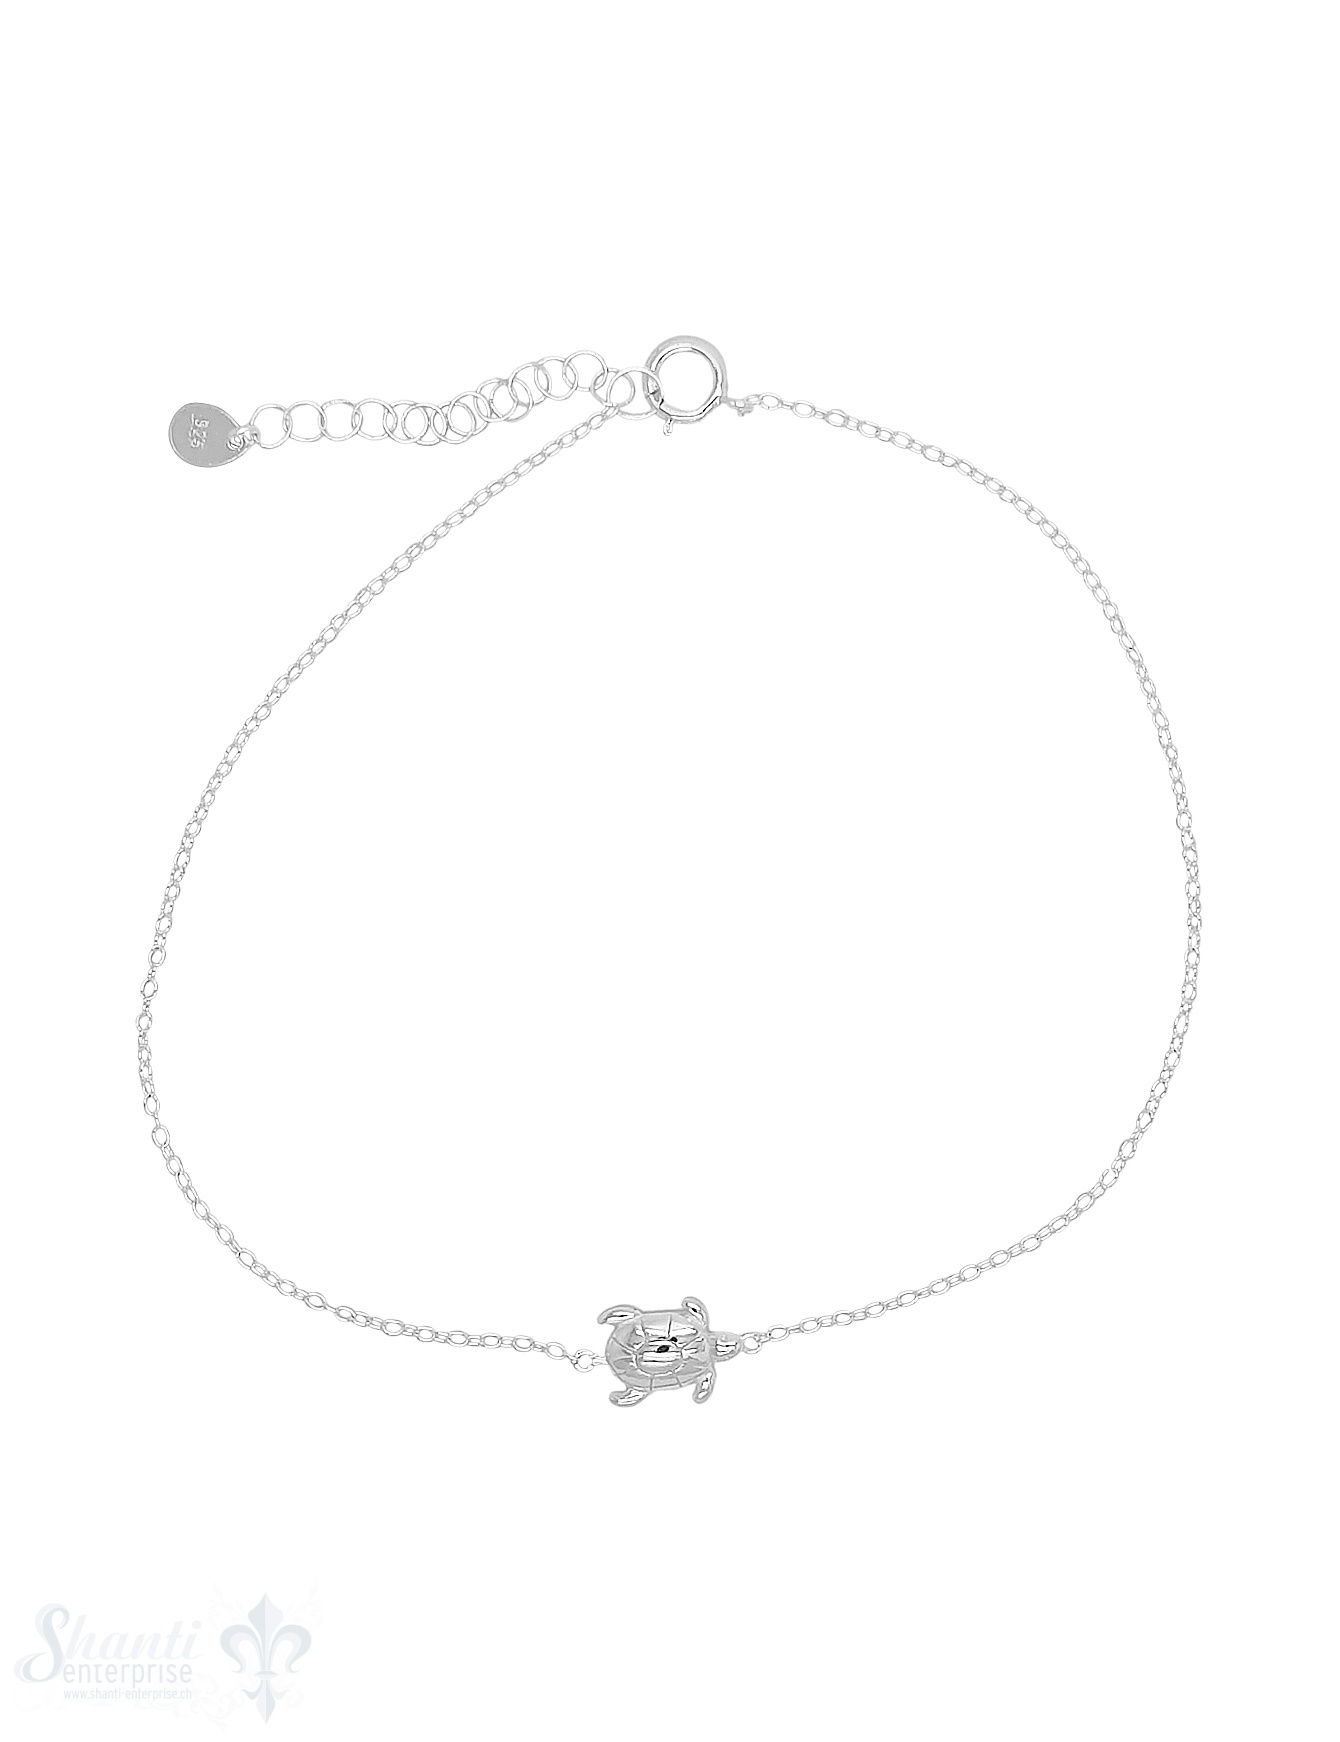 Fussketteli Silber hell Anker 23-26 cm mit